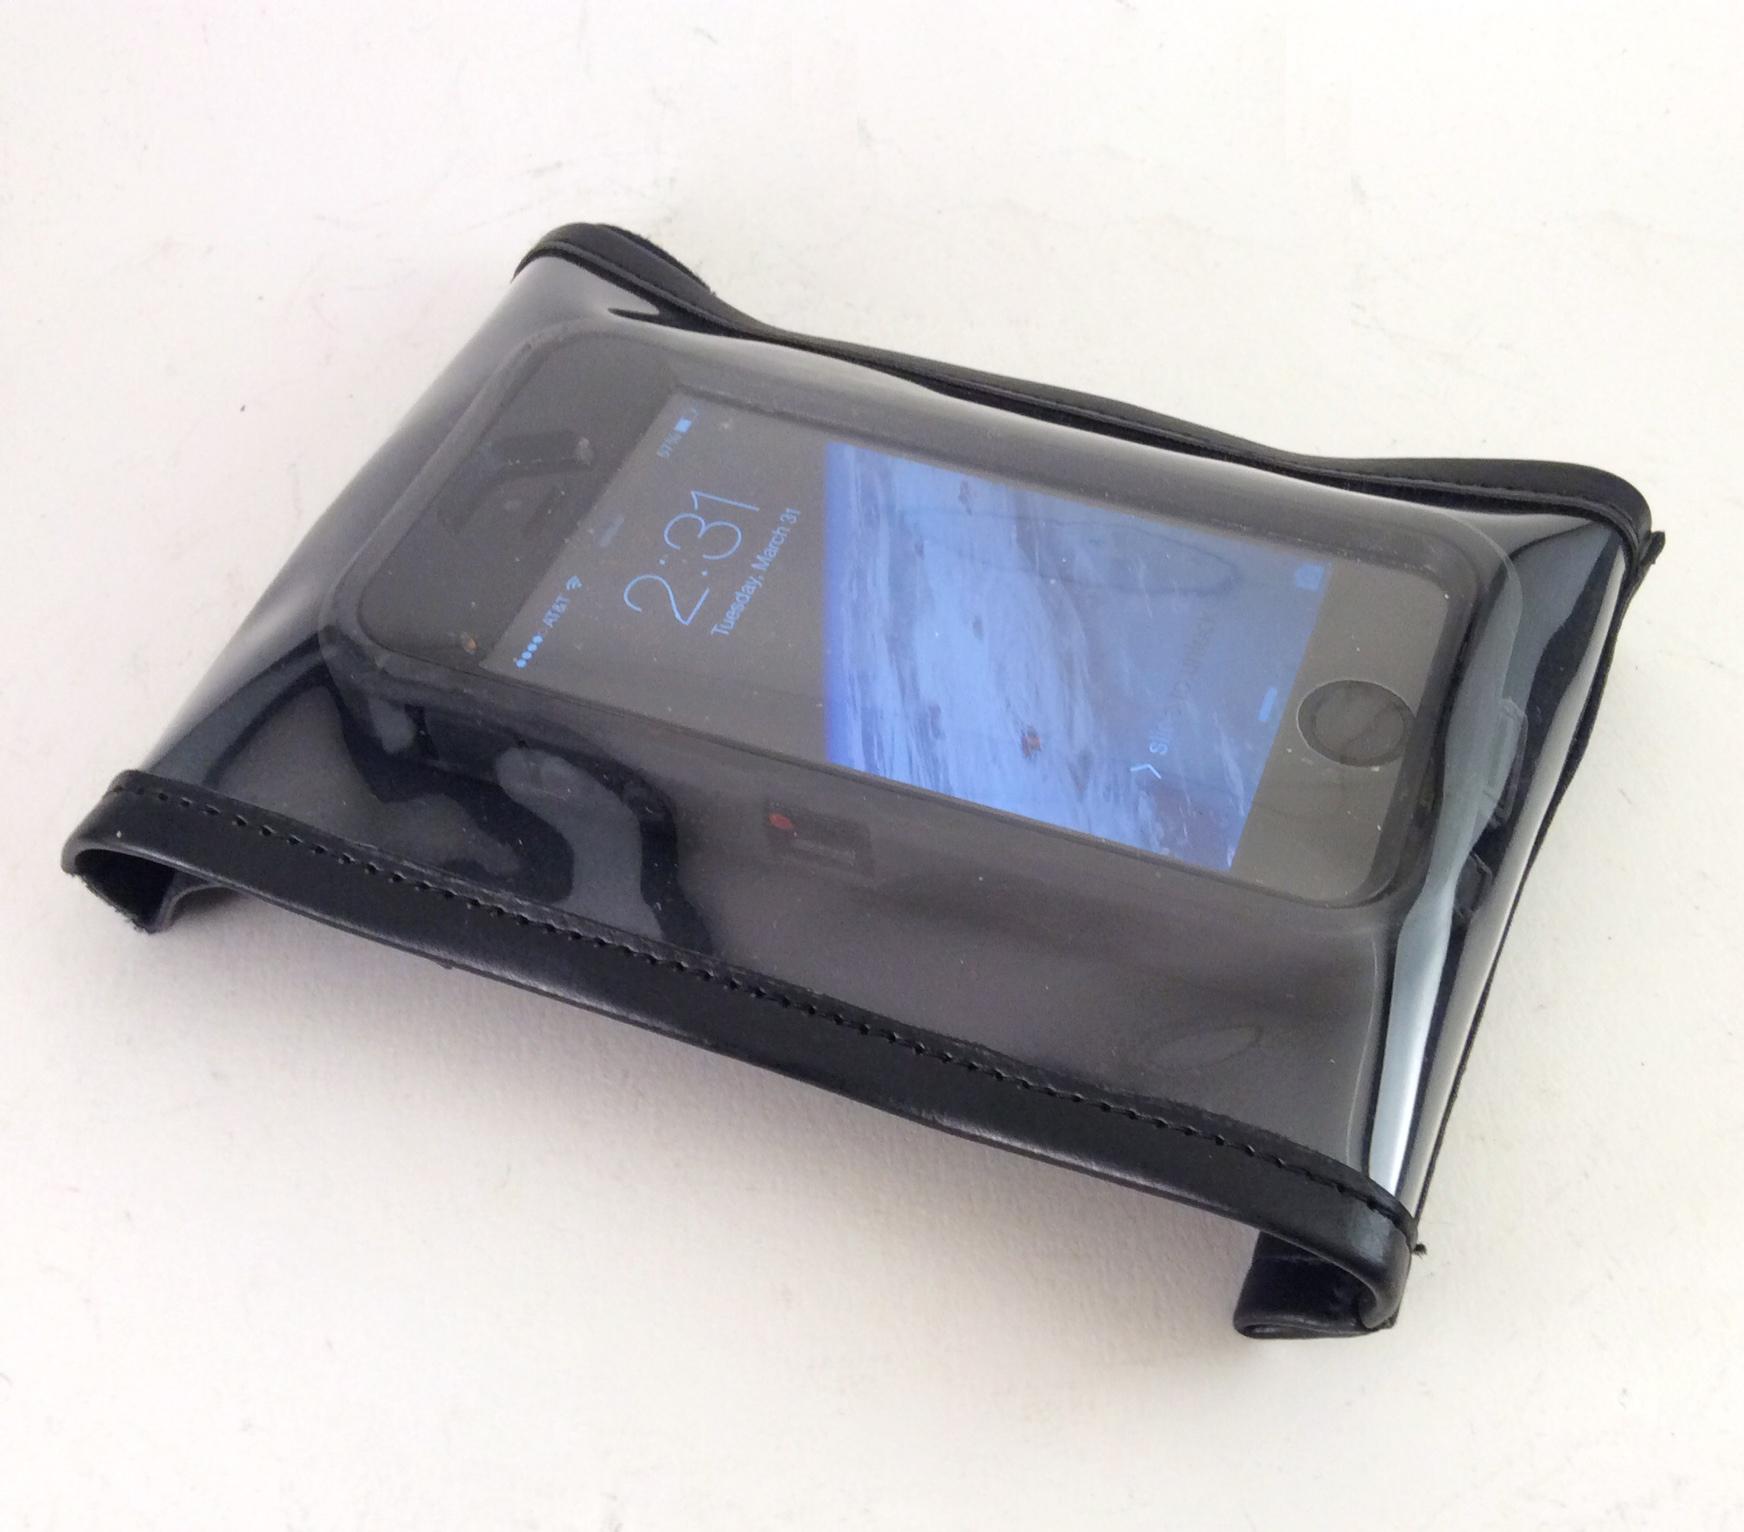 trilloboxblackwithphone.jpg